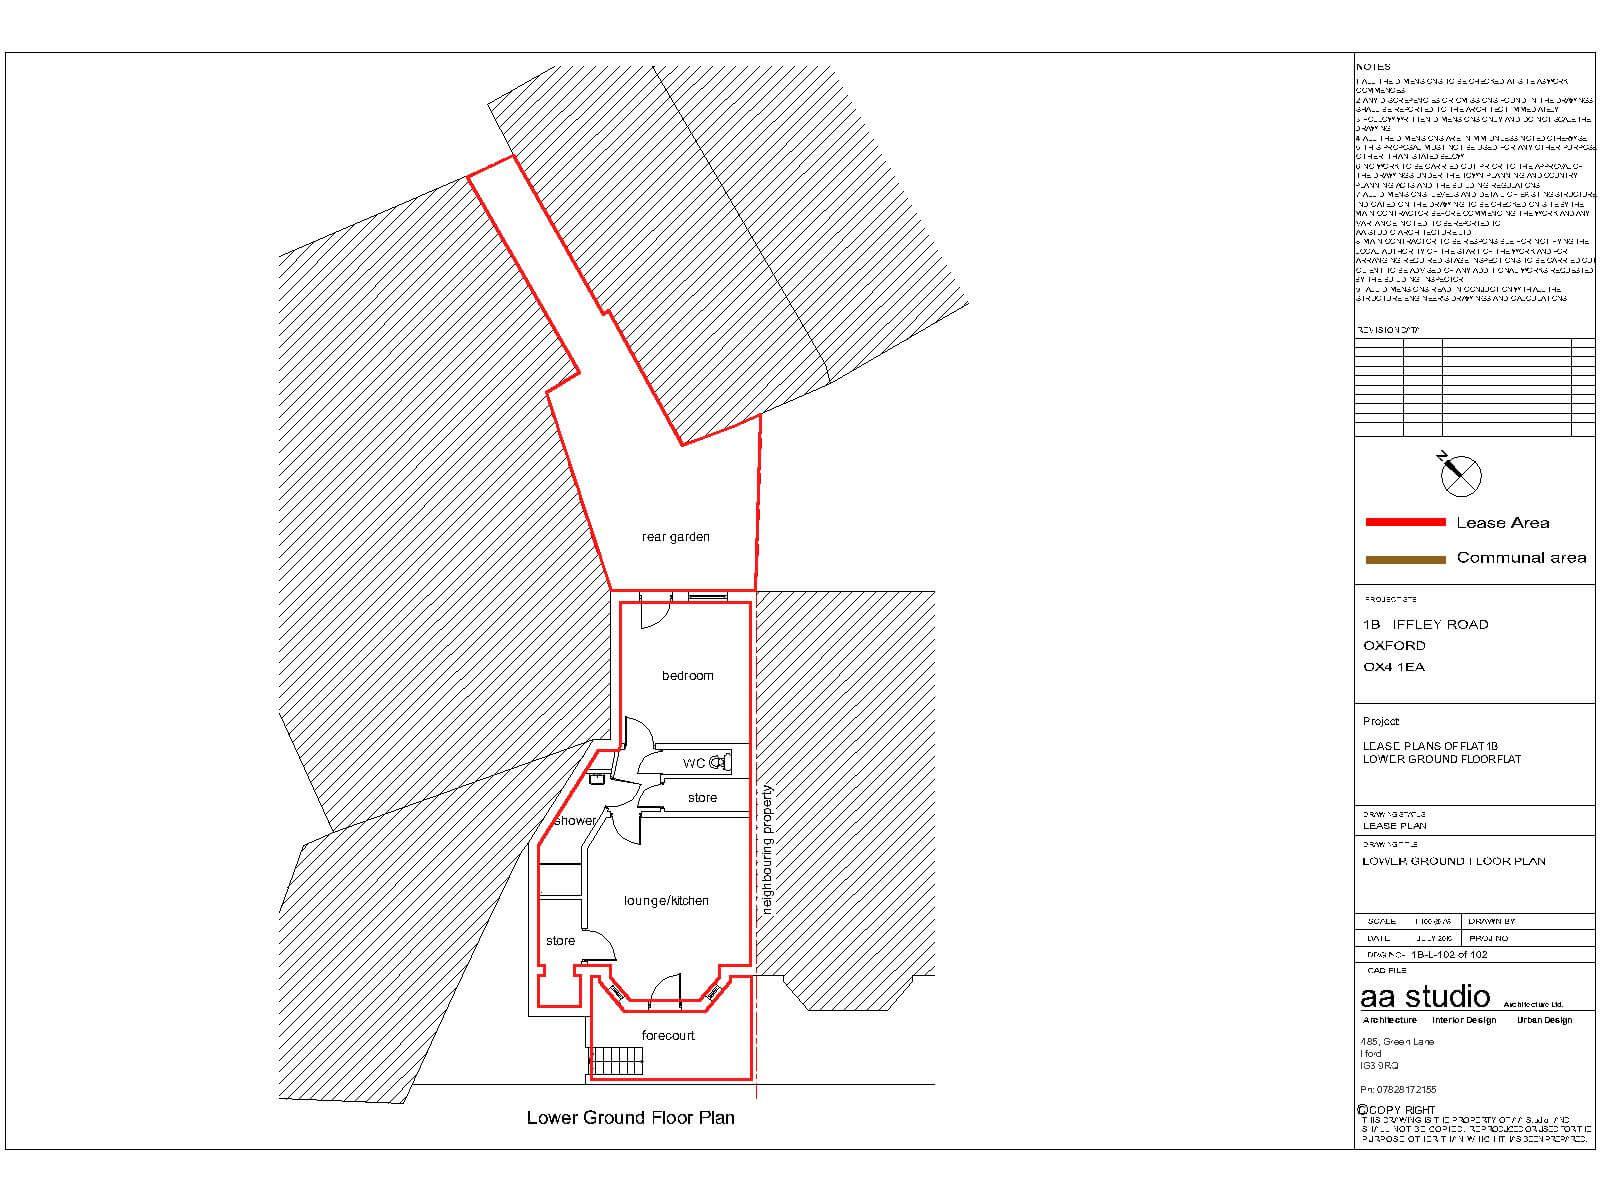 lease-plan-1-iffley-road-oxford-ox4-1ea-1b-l-102